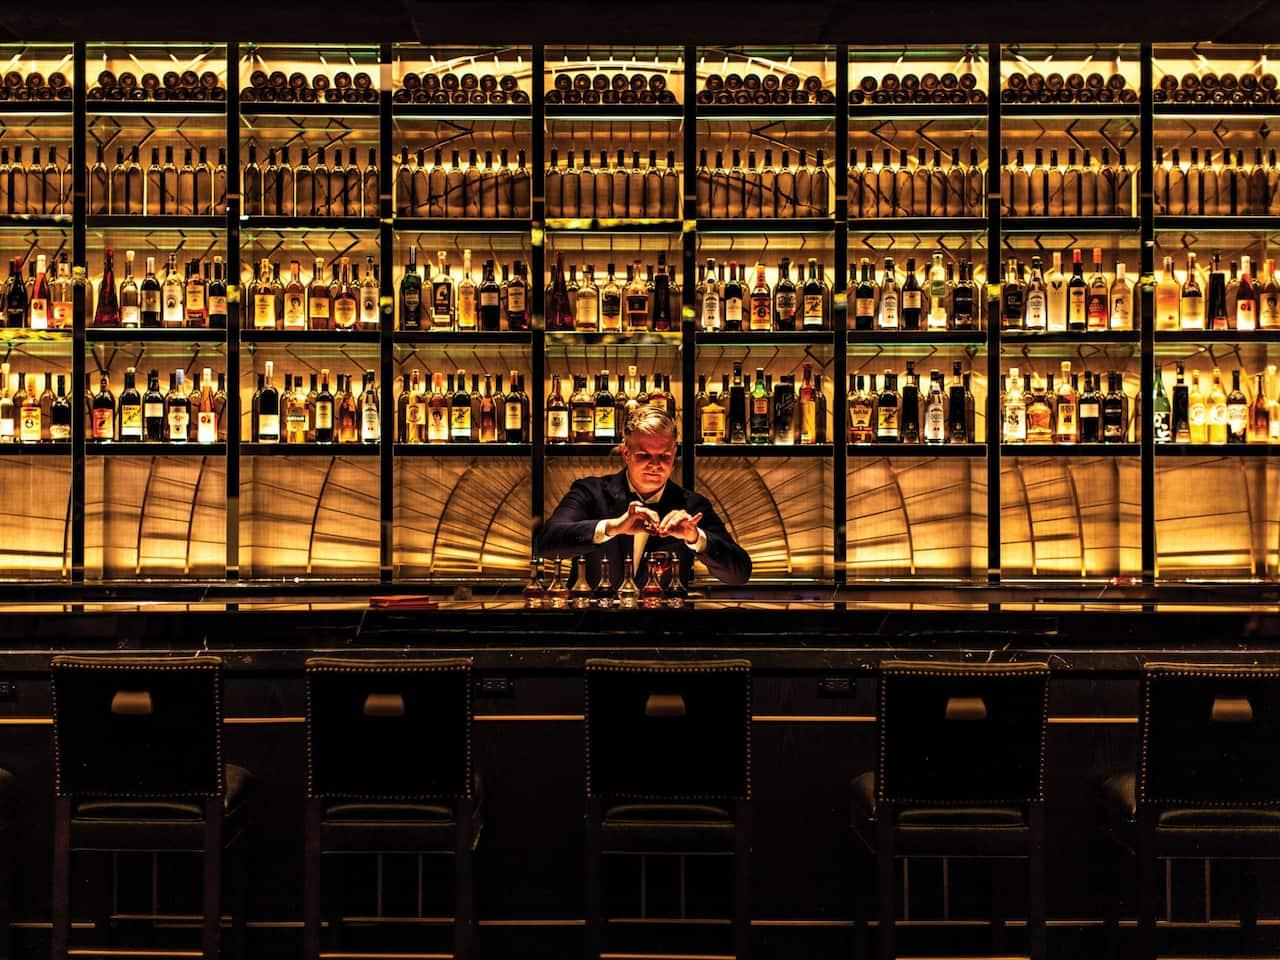 Bar with Barman